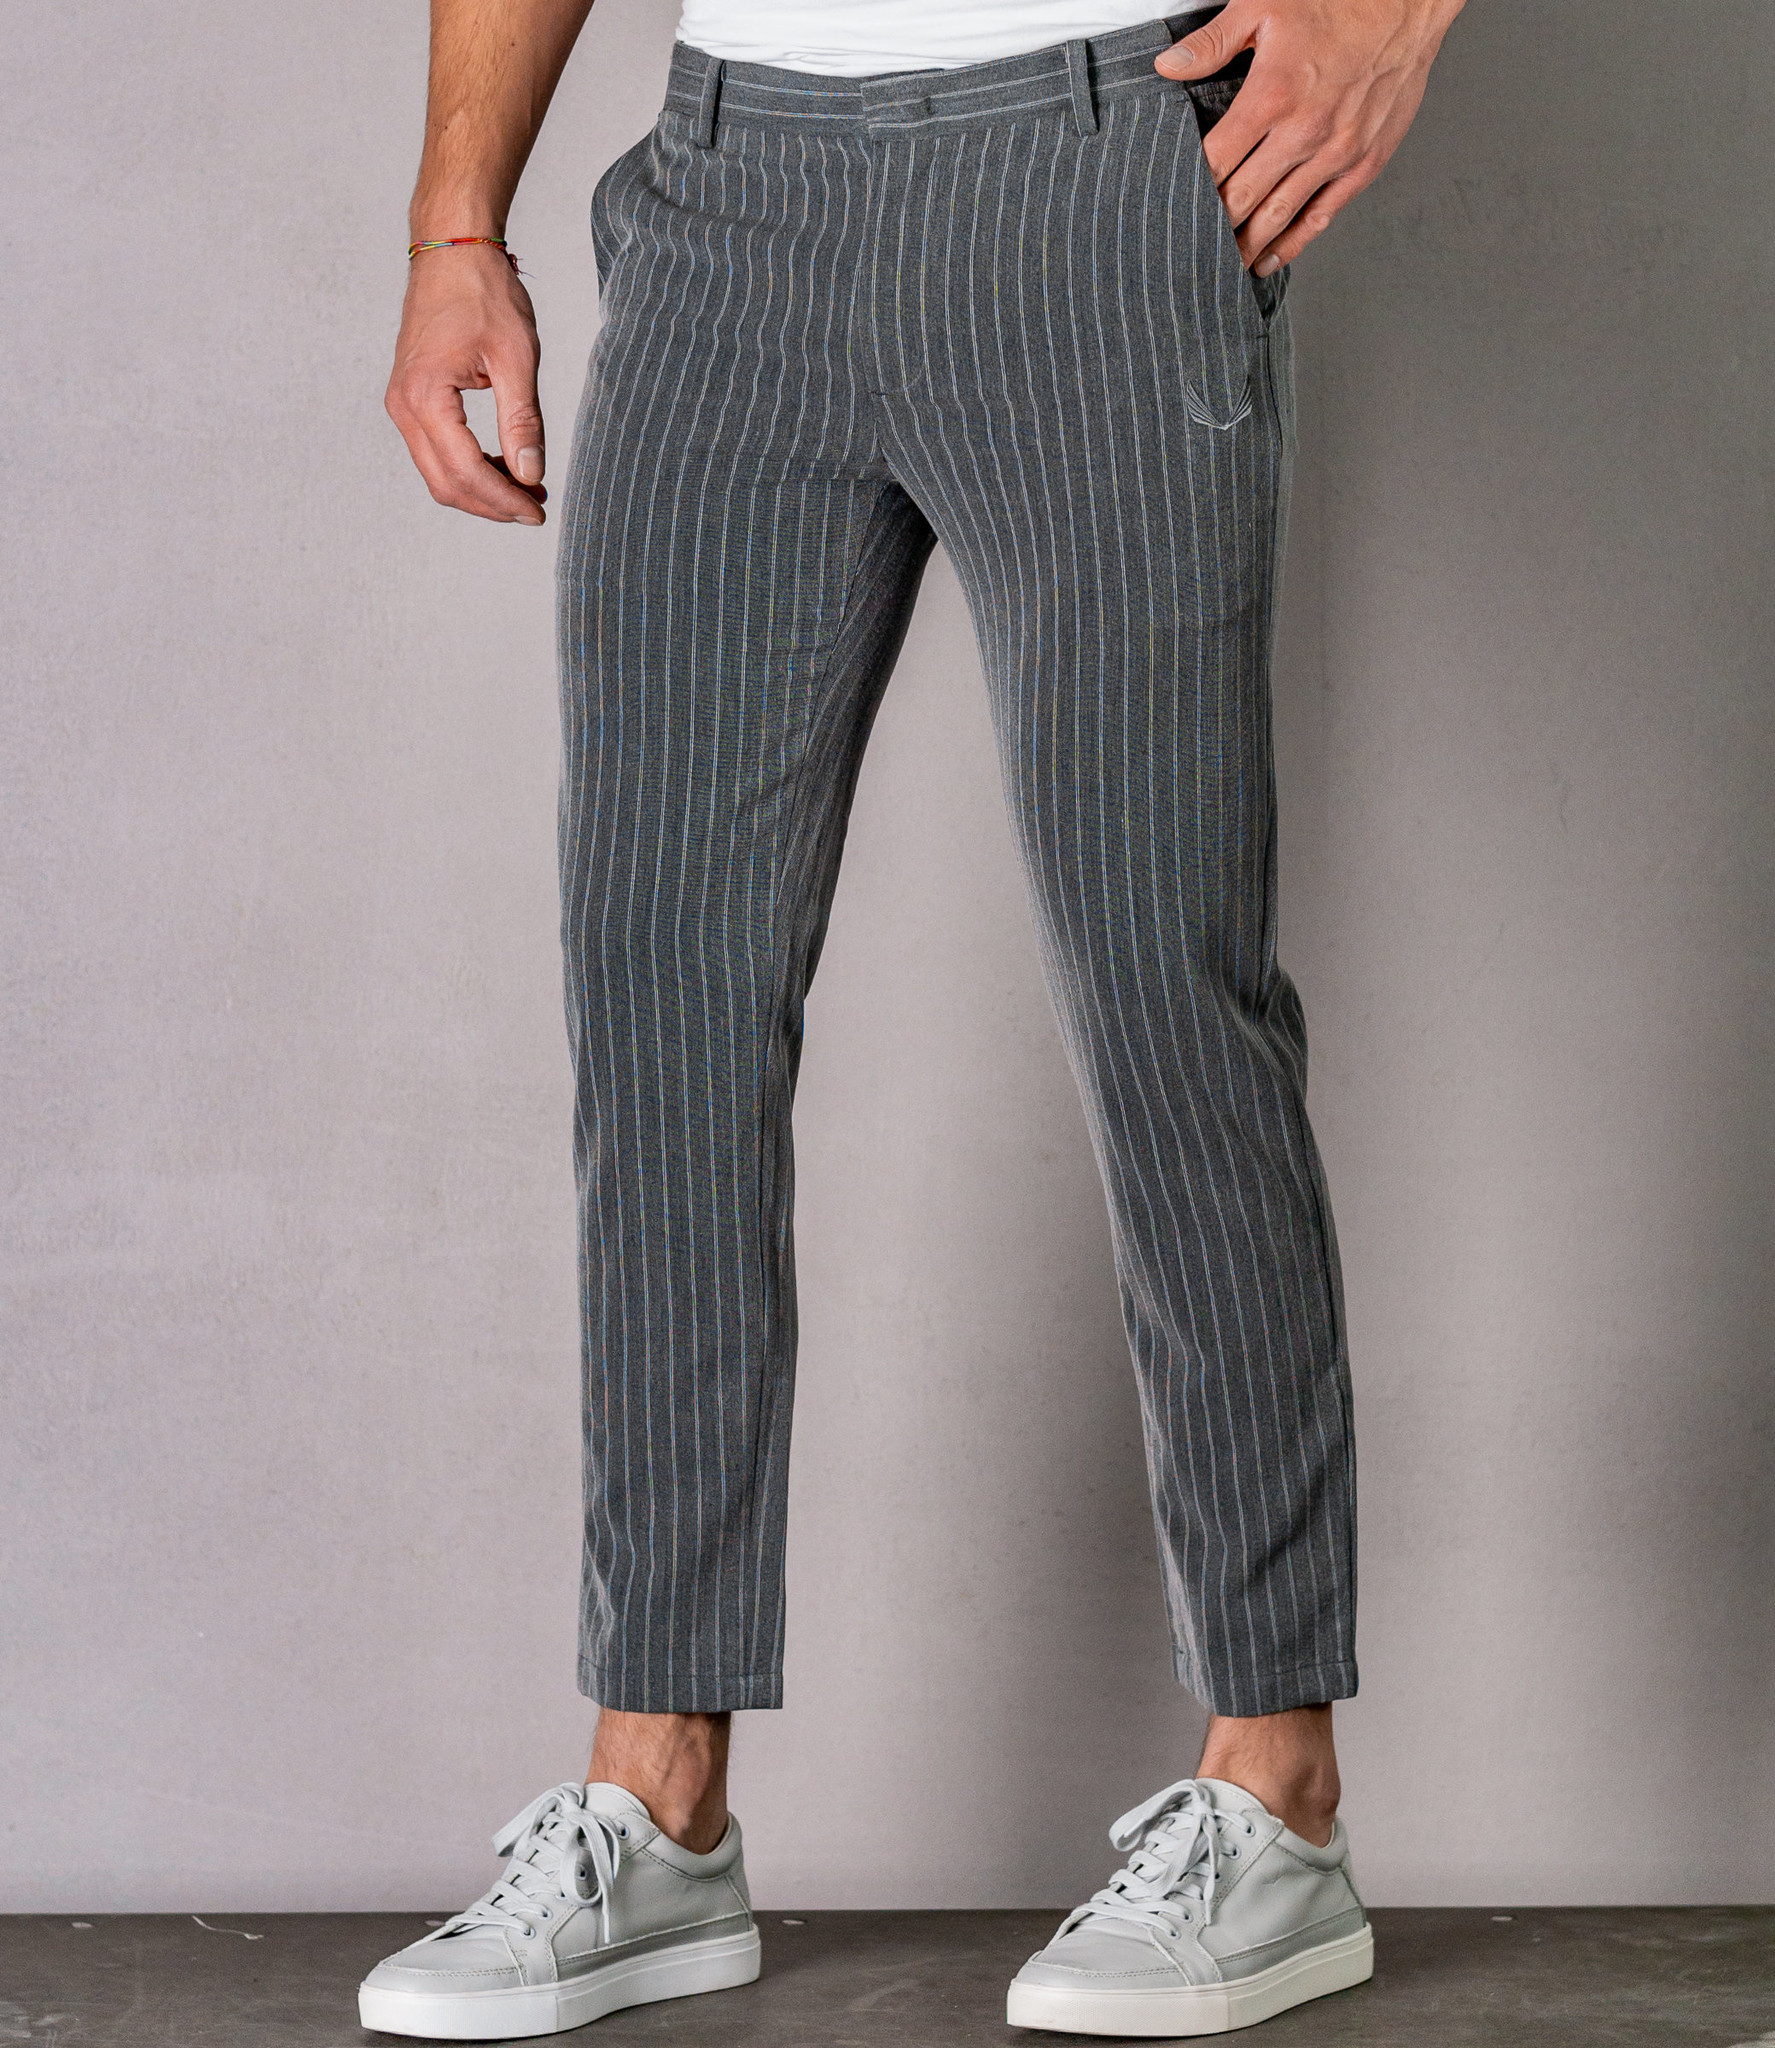 Zumo Slim Fit Pants BRIDGE Grey